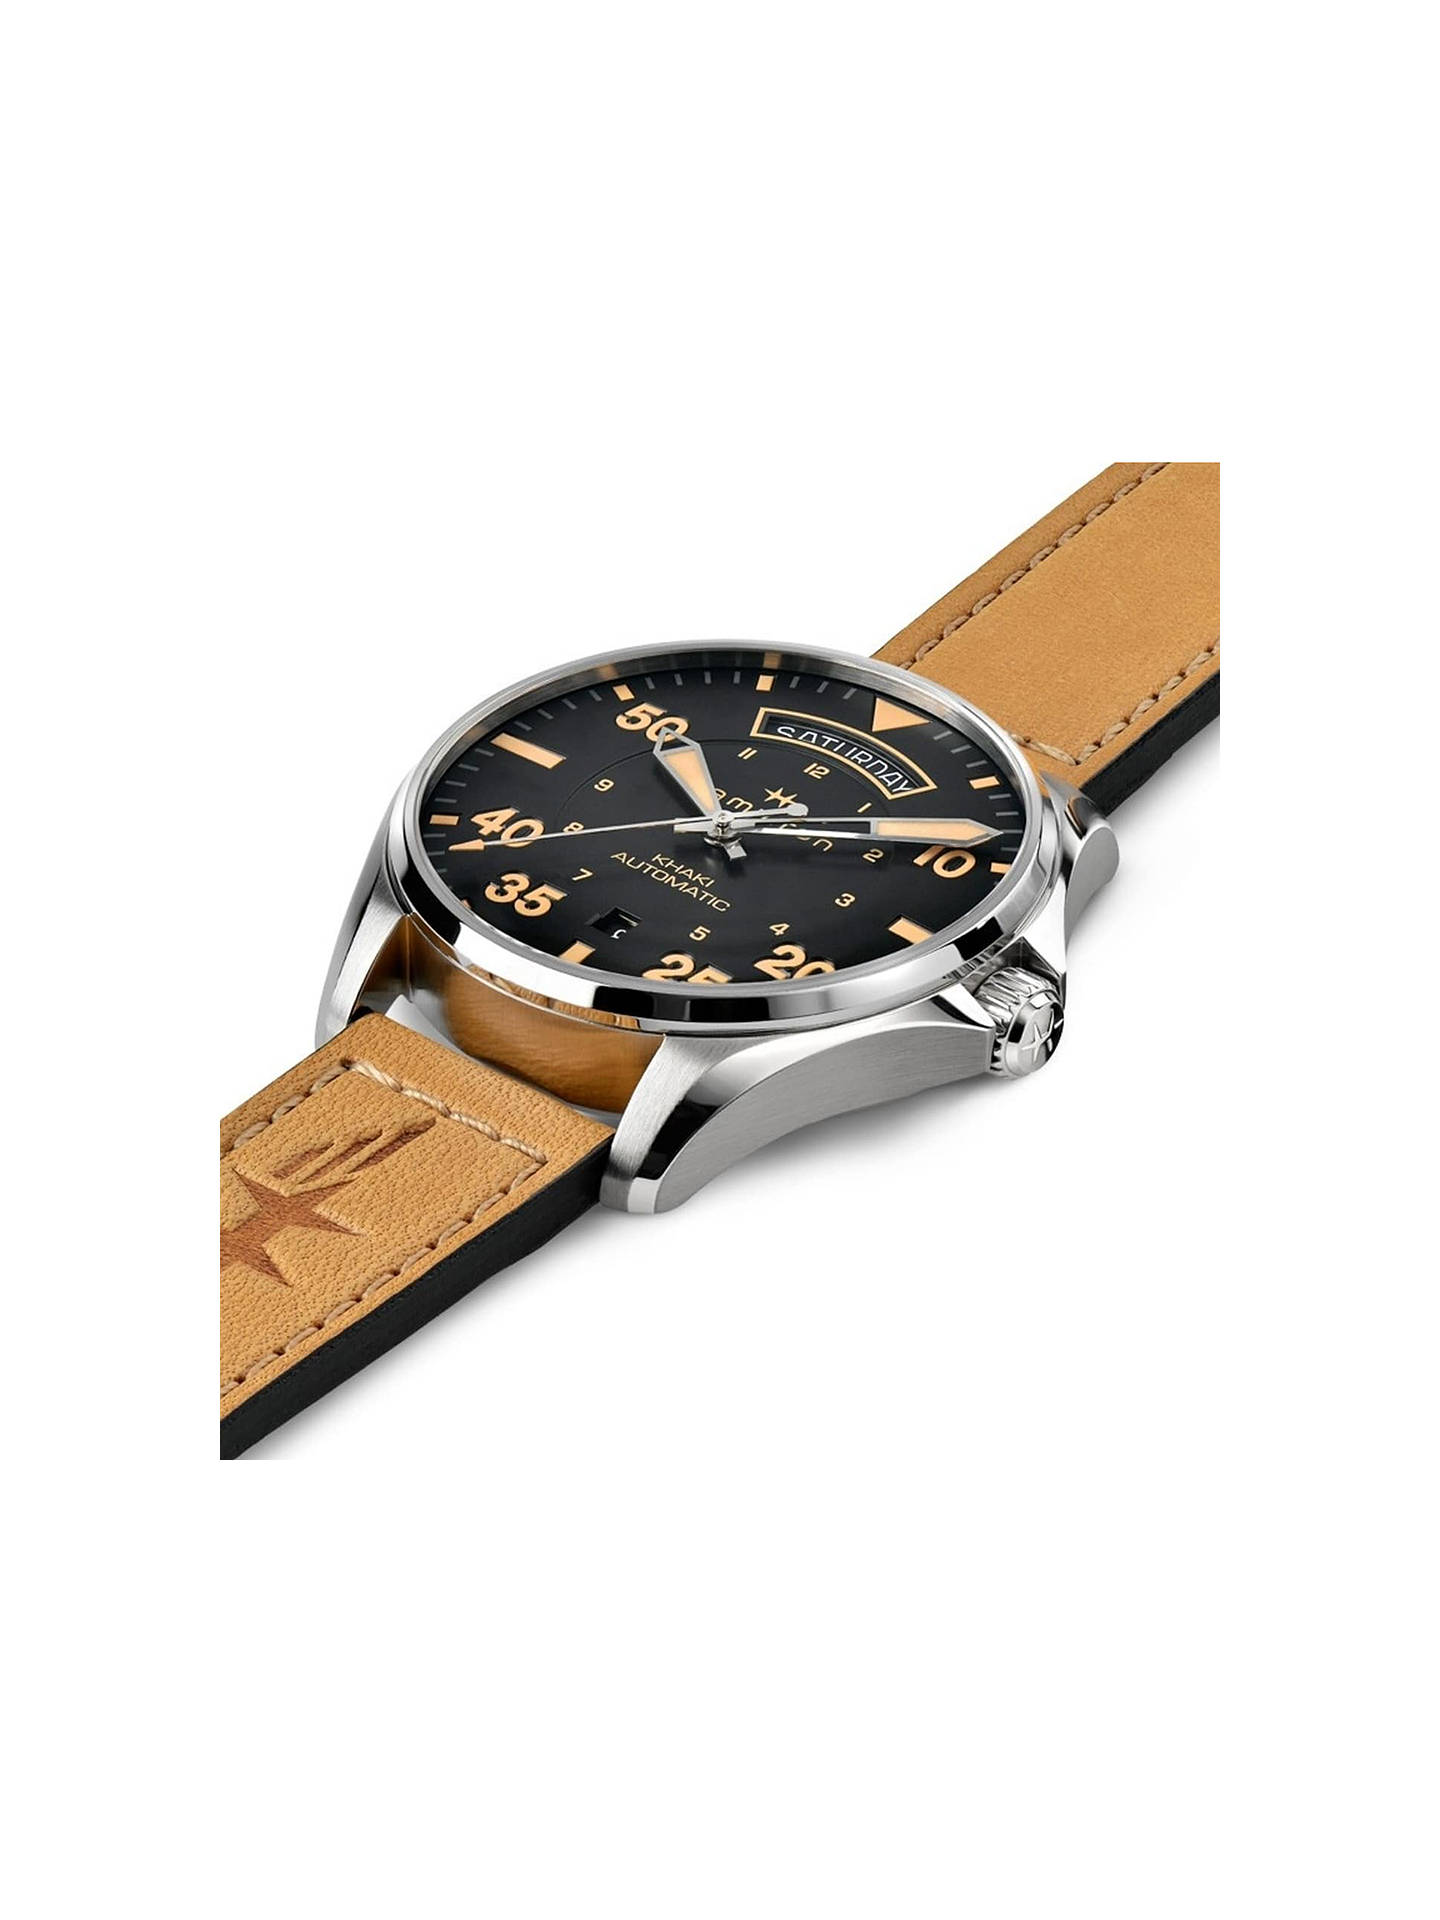 d685b99a0 ... Buy Hamilton H64645531 Men's Khaki Pilot Day Date Automatic Leather  Strap Watch, Tan/Black ...